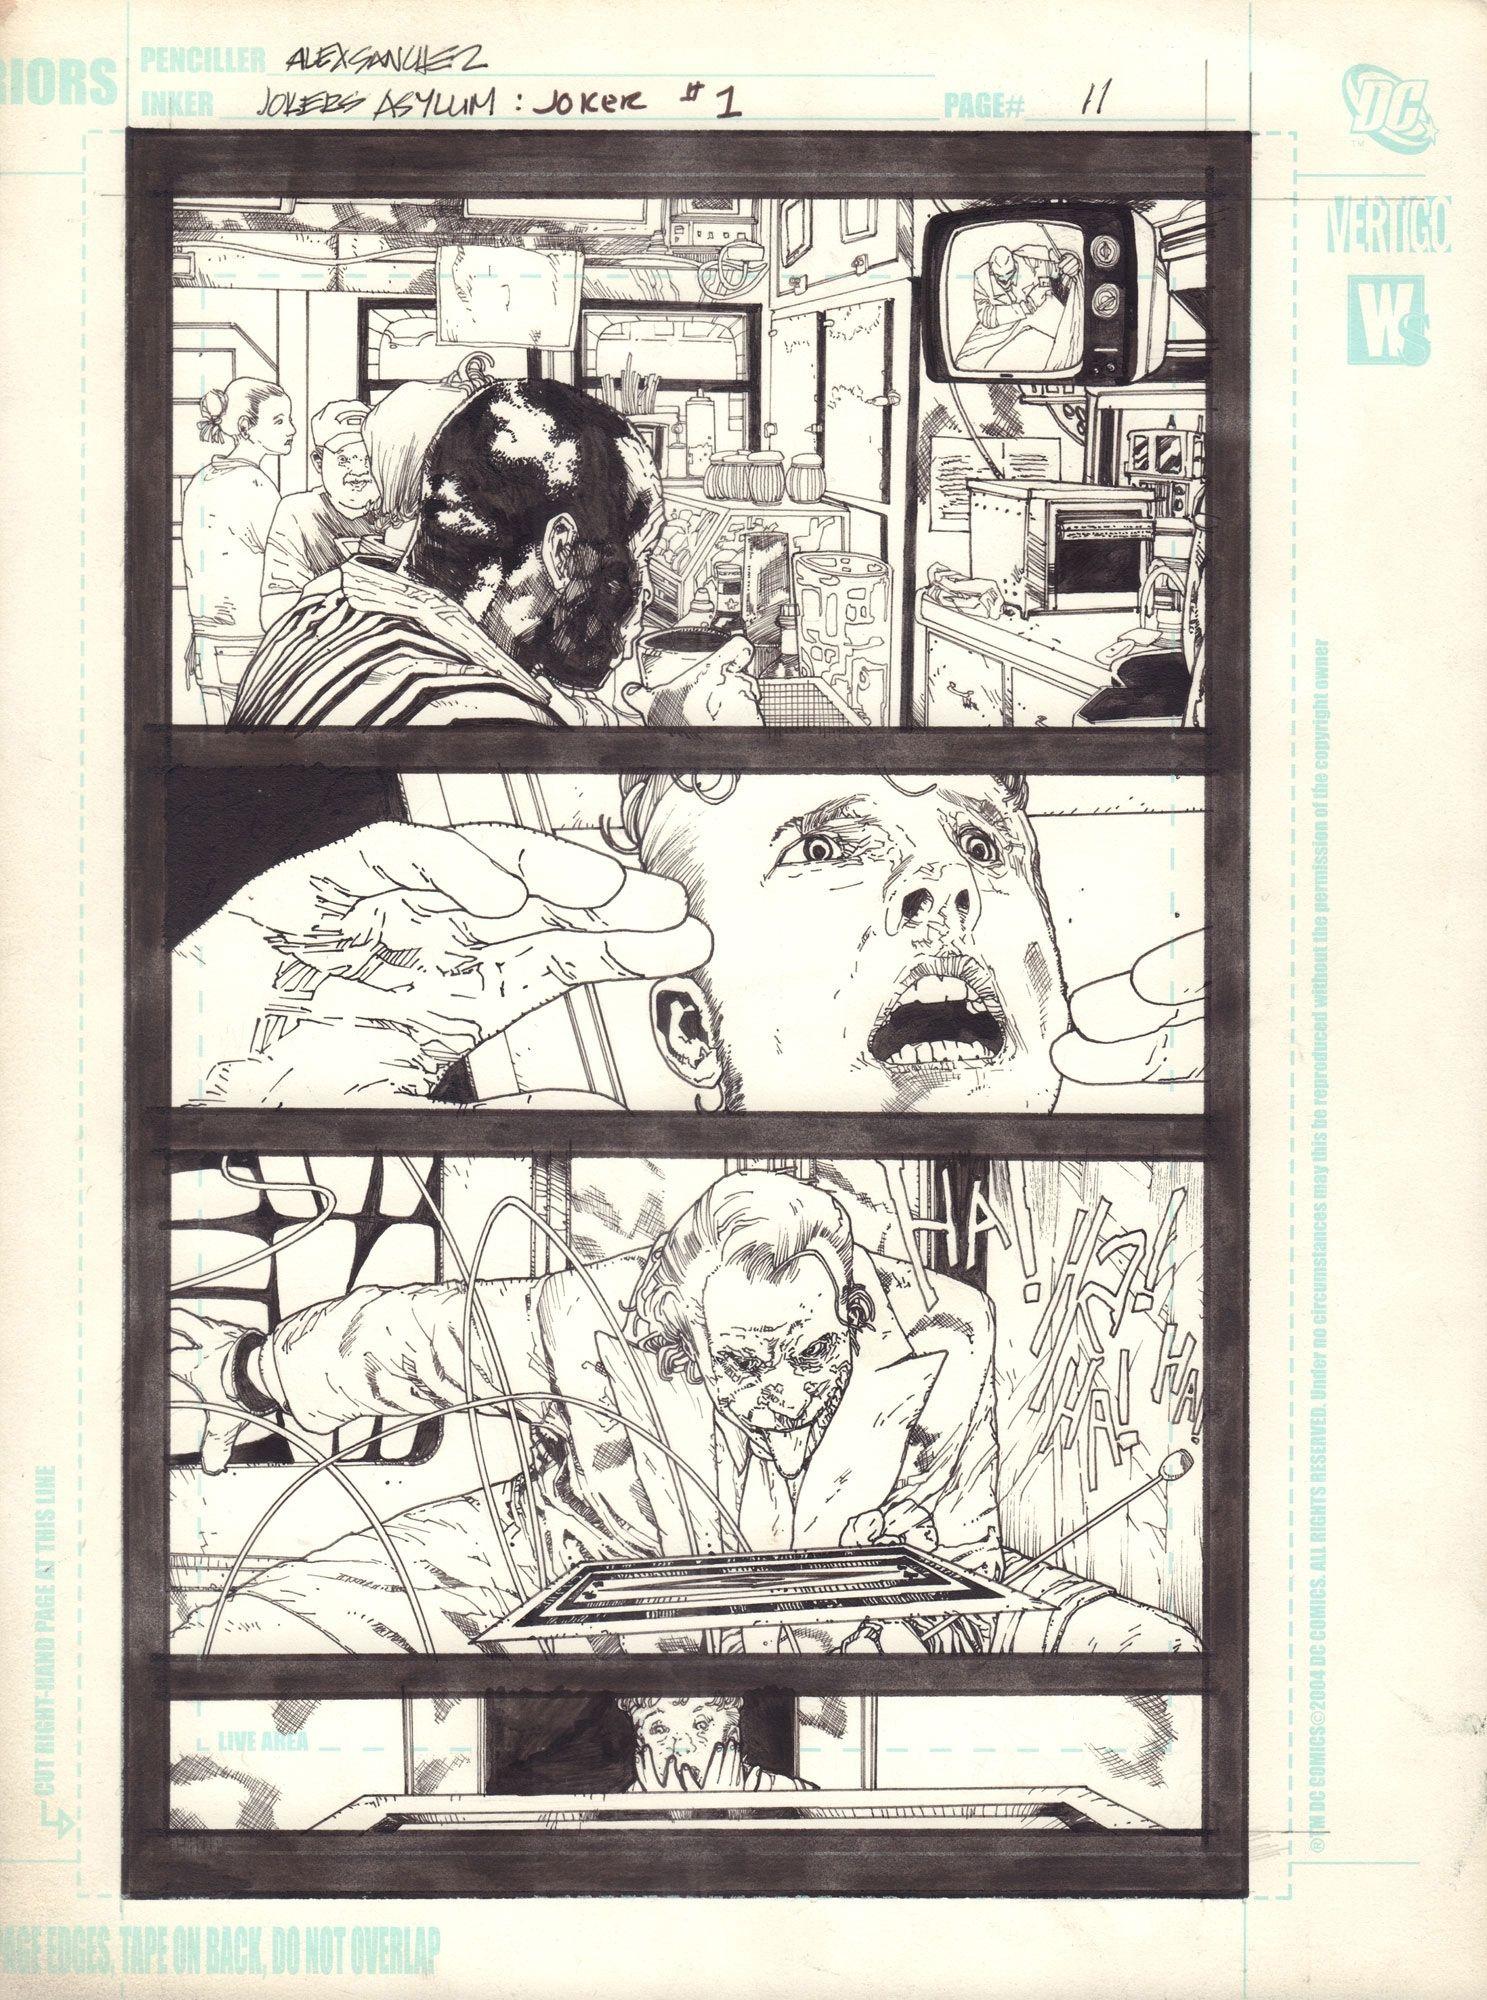 Joker's Asylum: The Joker, s. 11